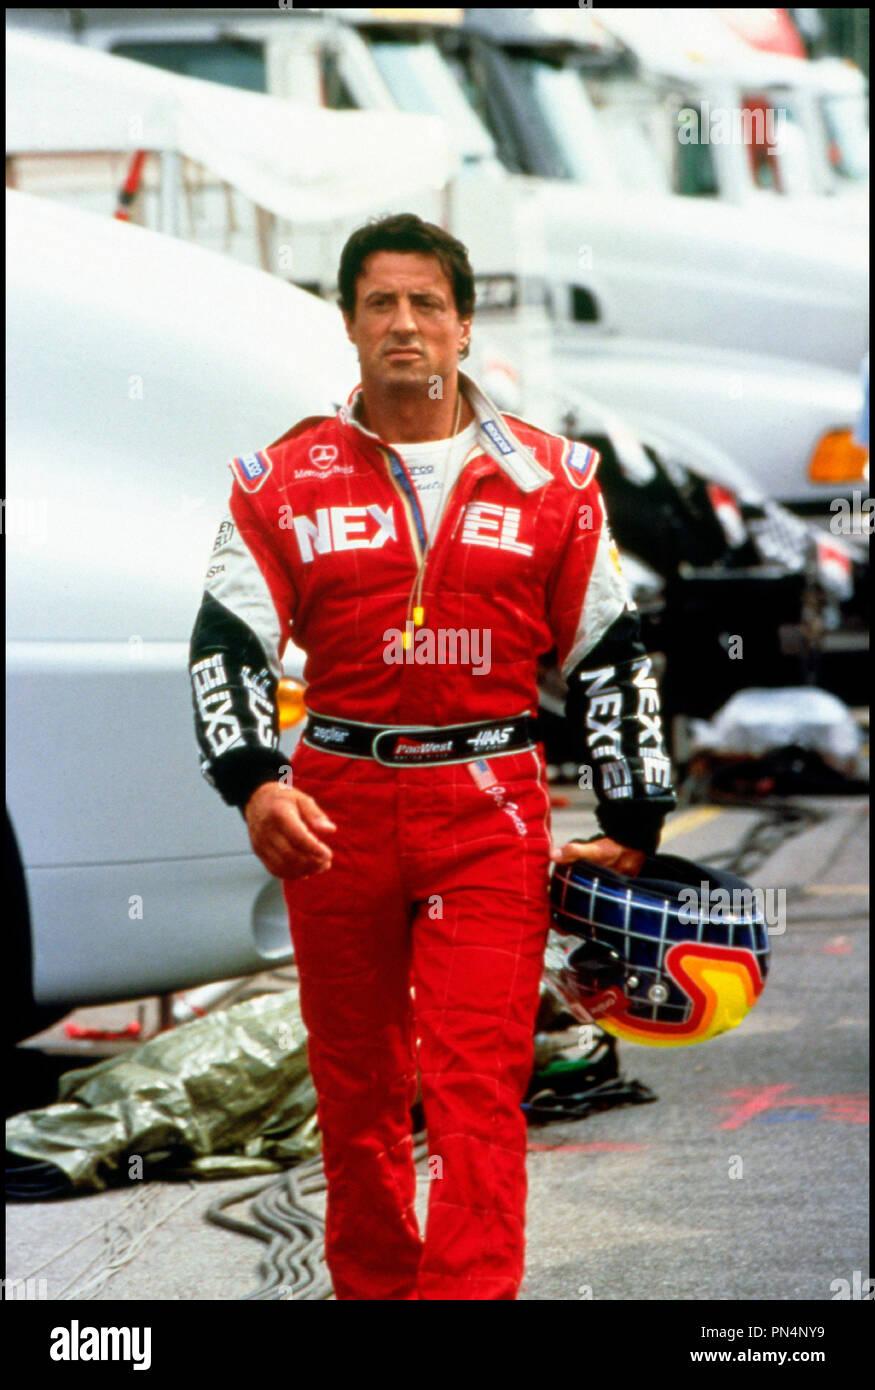 Prod DB © Franchise Pictures / DR DRIVEN (DRIVEN) de Renny Harlin 2001 USA avec Sylvester Stallone pilote, formule 1, casque - Stock Image